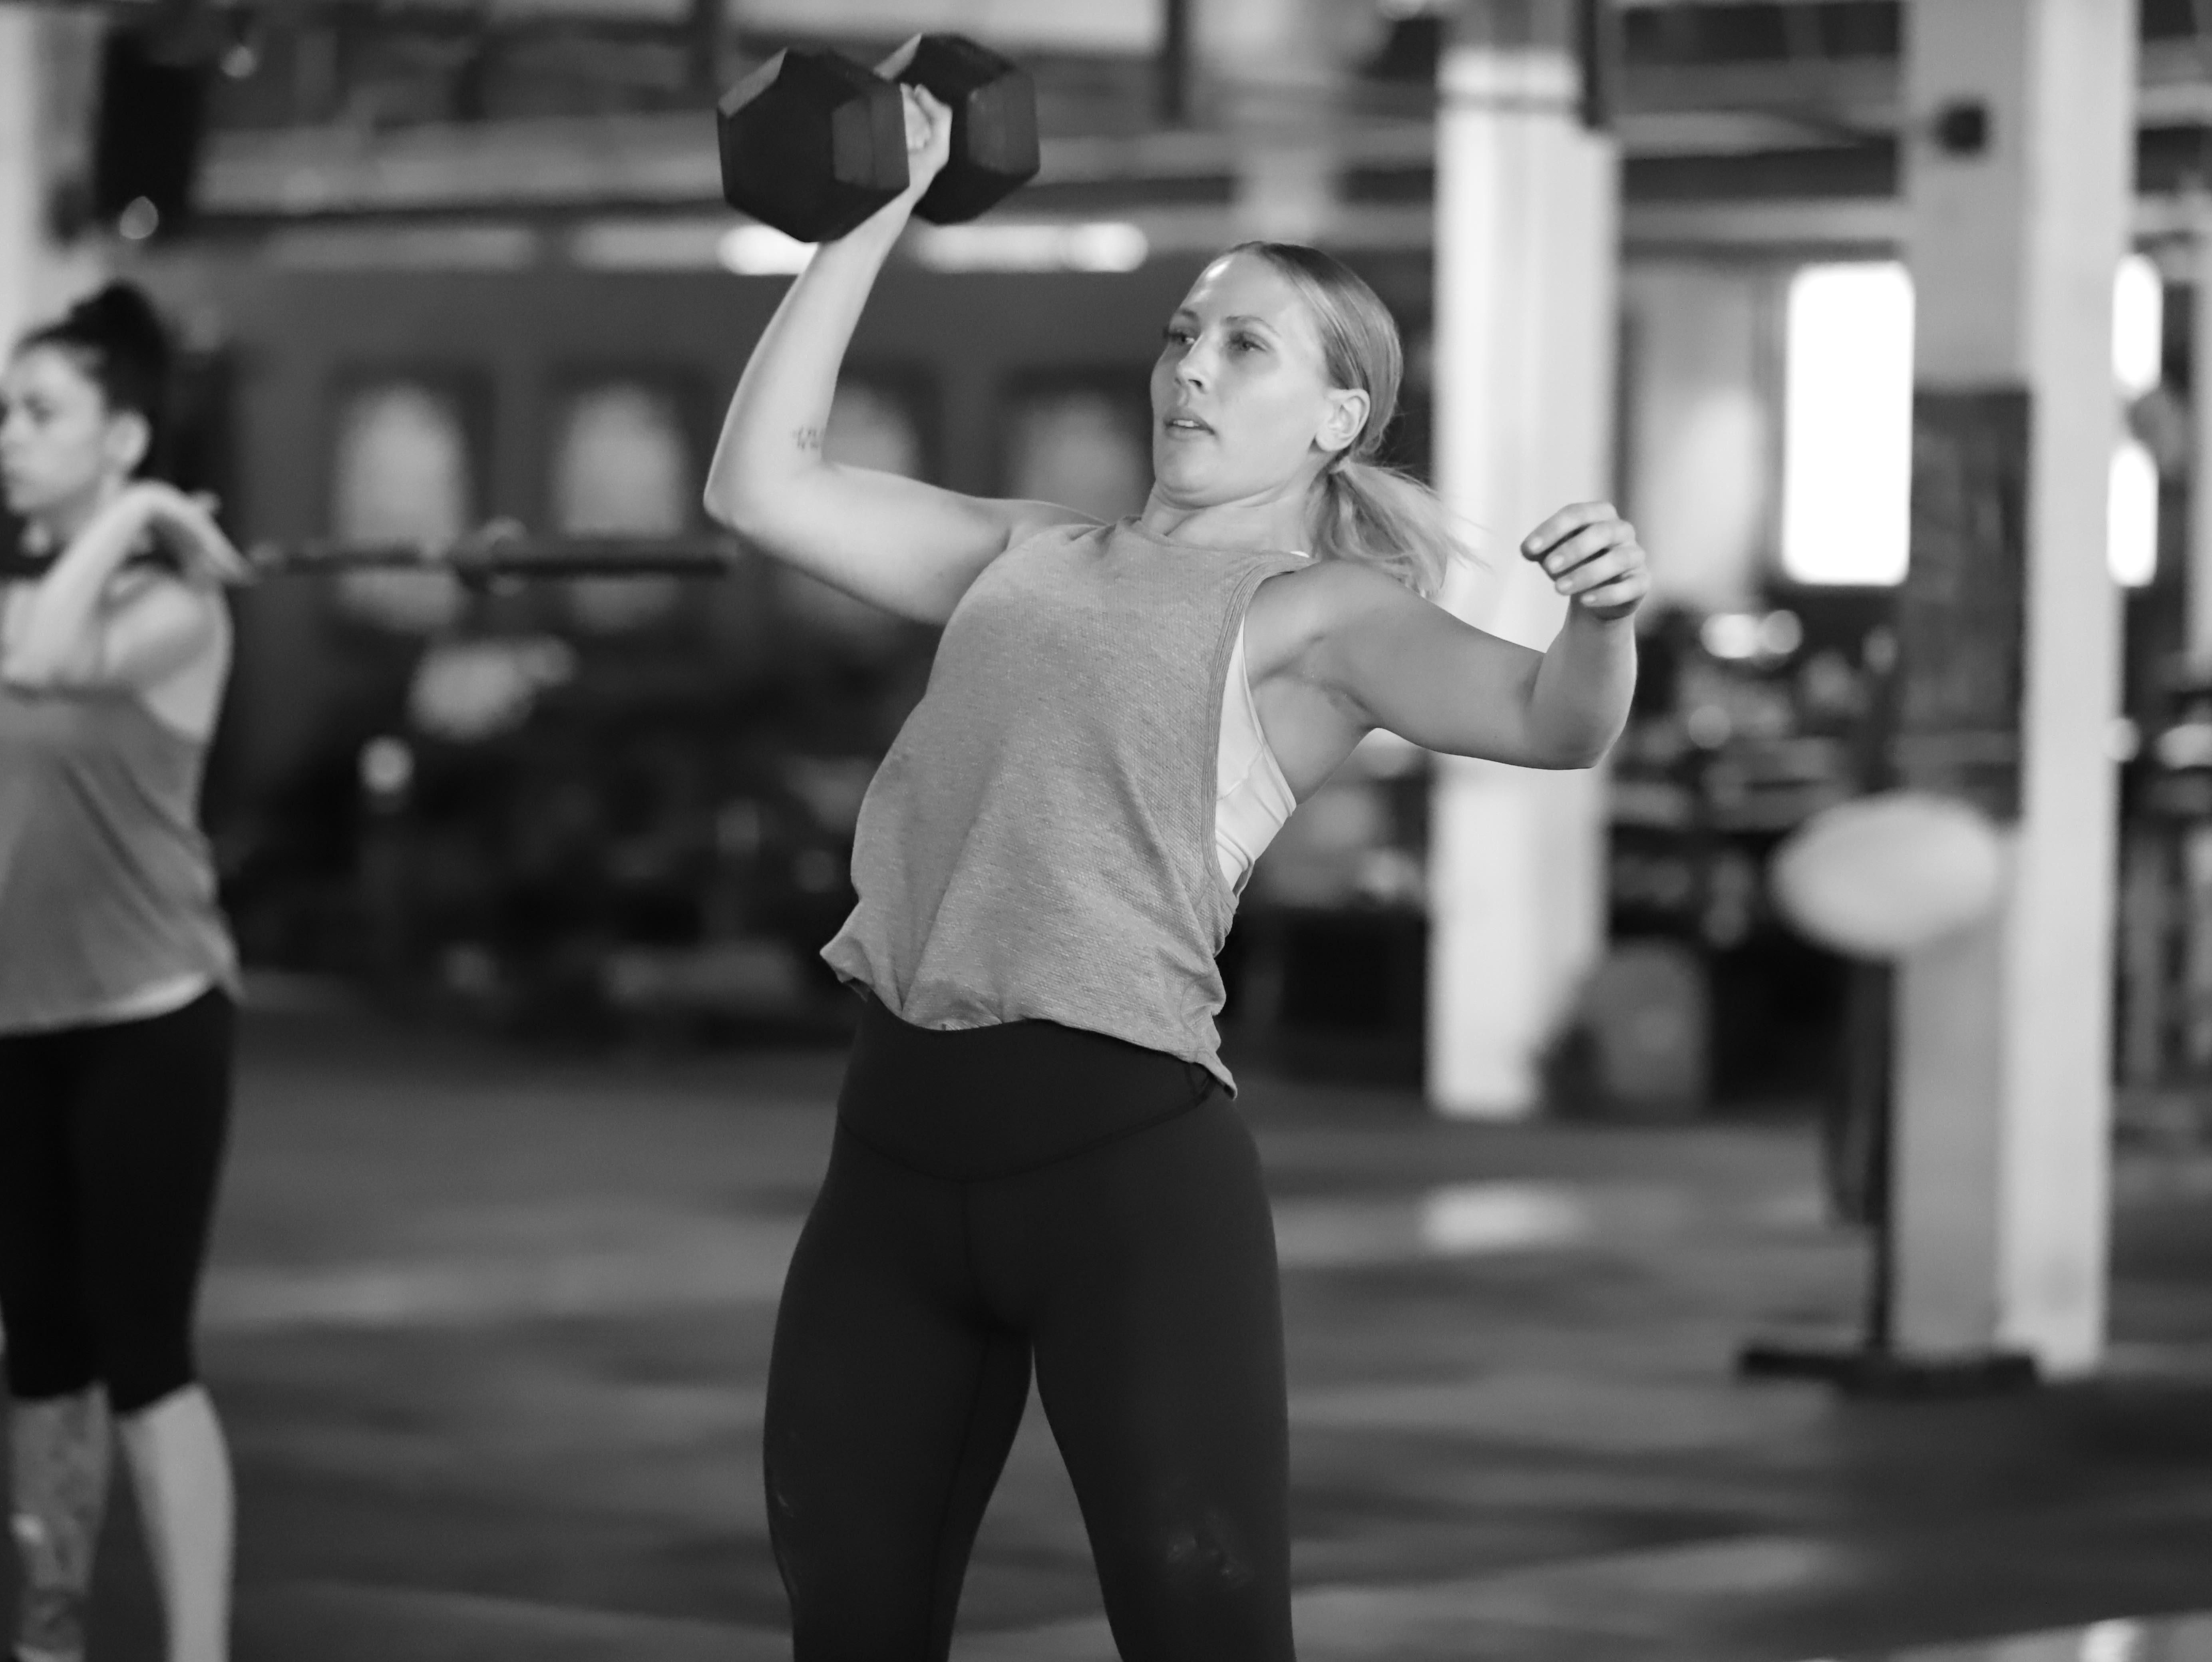 CrossFit On-Ramp for beginners